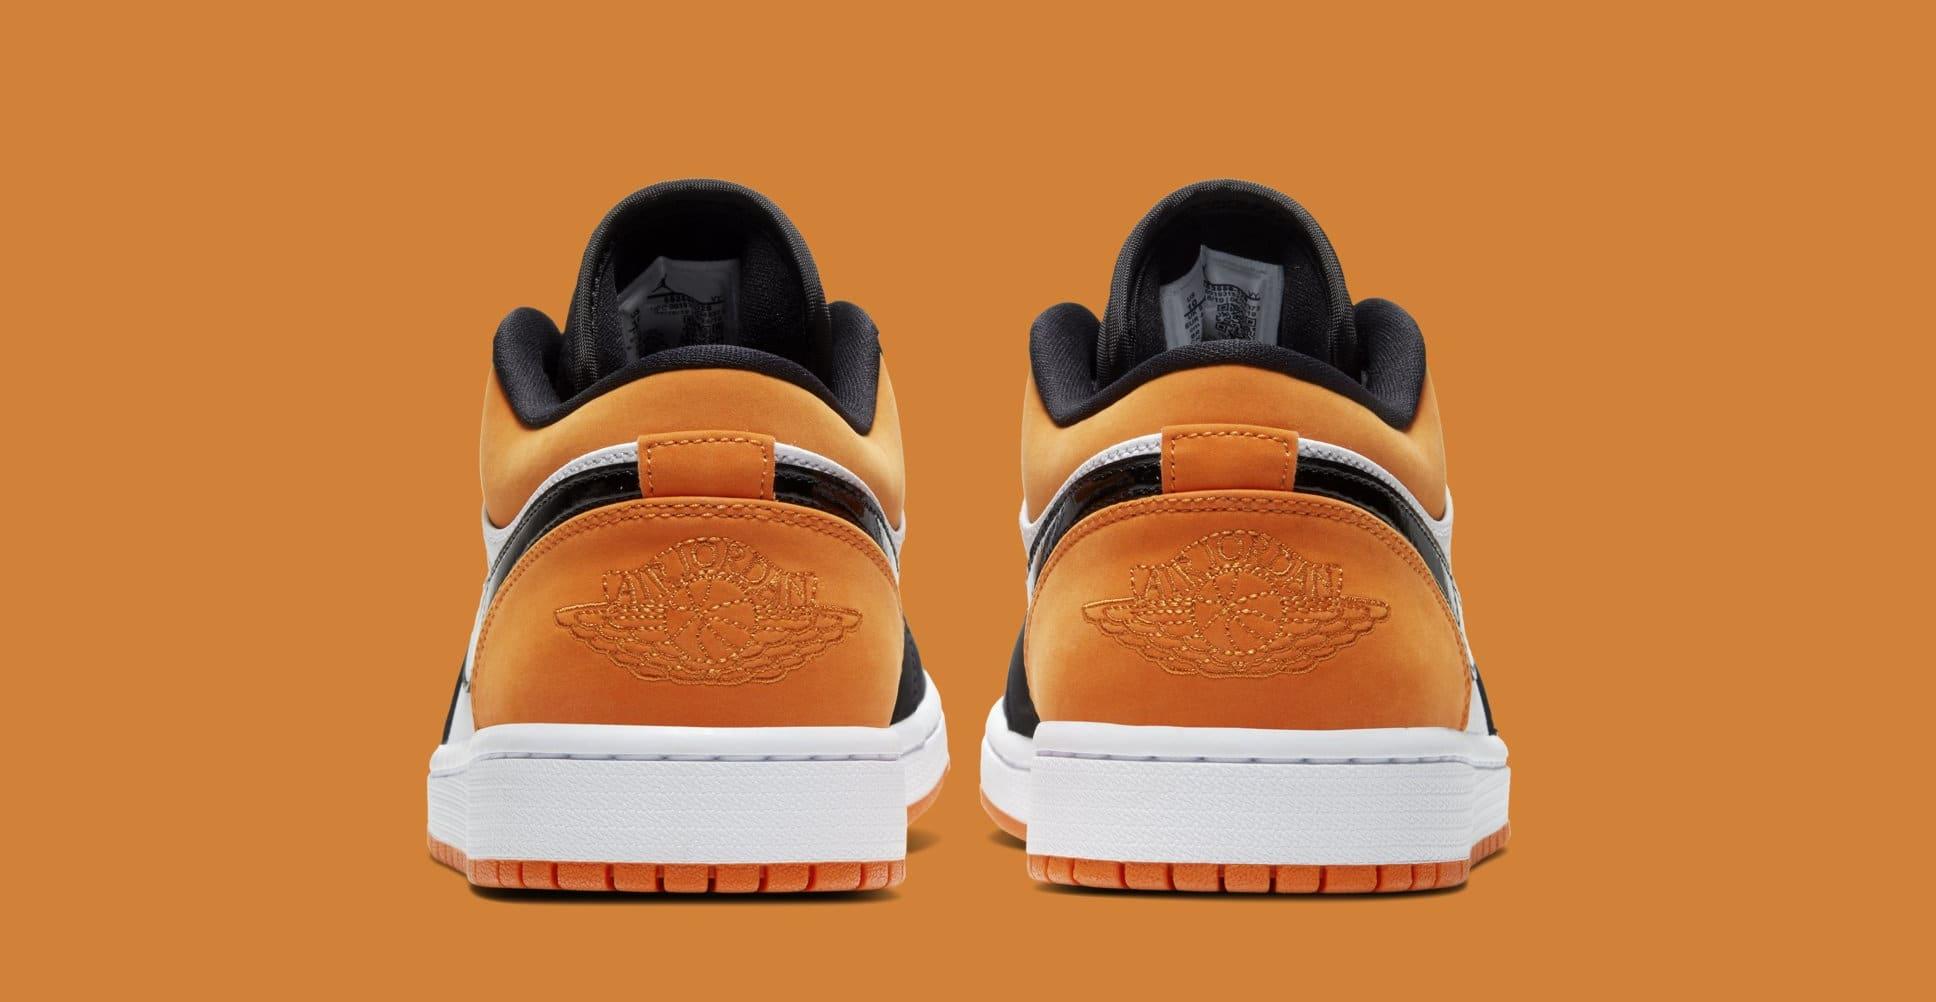 Air Jordan 1 Low 'Shattered Backboard' 553558-128 (Heel)